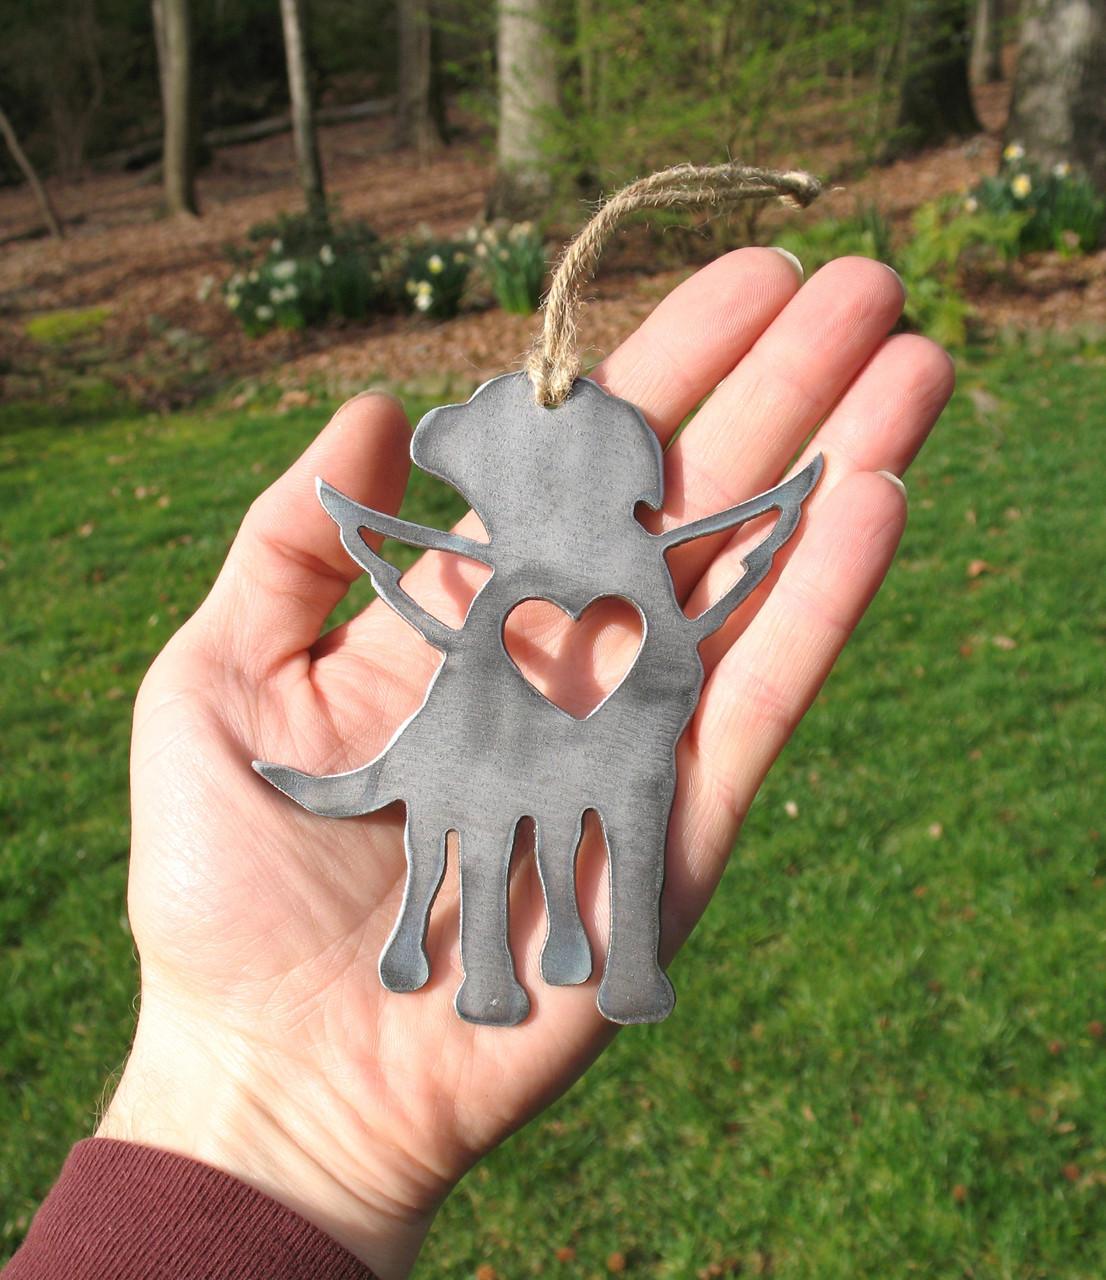 Labrador Retriever Dog Ornament 1 Pet Memorial W/ Angel Wings - Pet Loss Dog Sympathy Remembrance Gift - Metal Dog Christmas Ornament